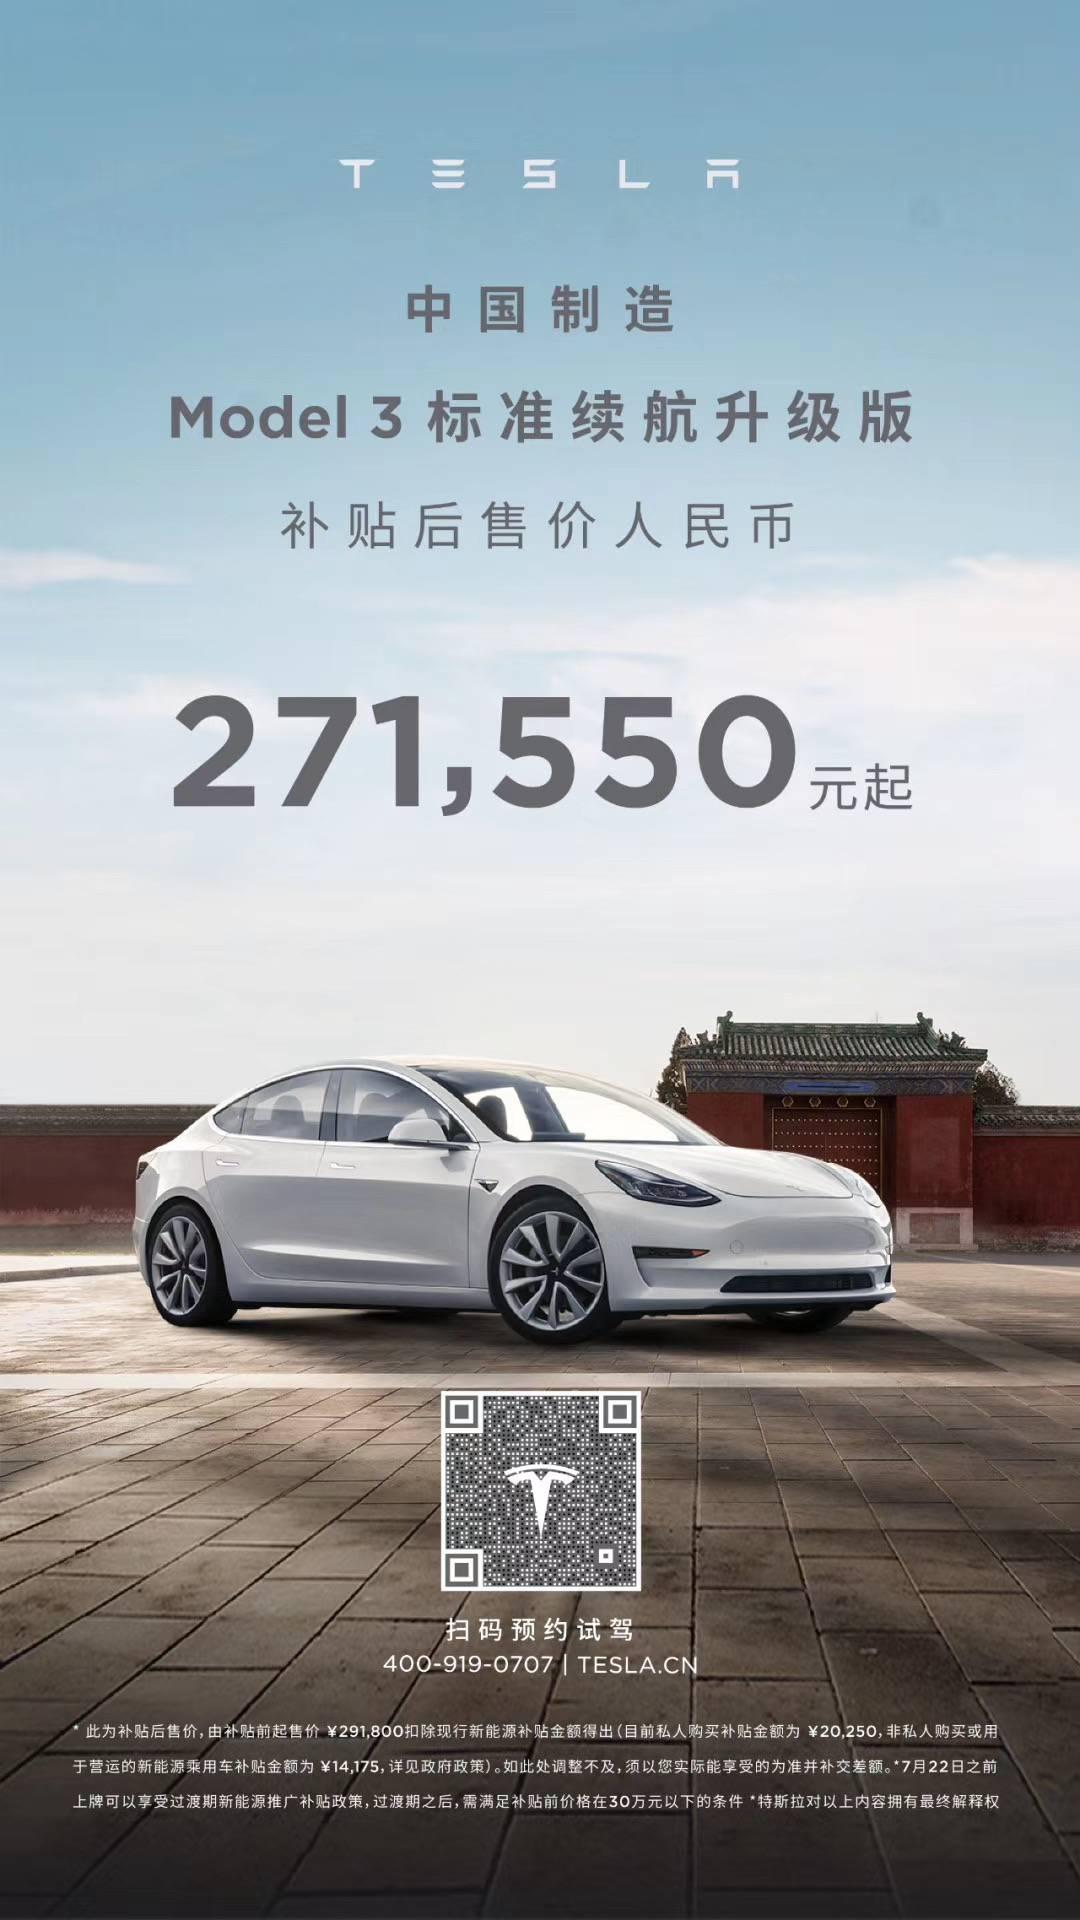 Model 3标准续航升级版削价海报/特斯拉官方